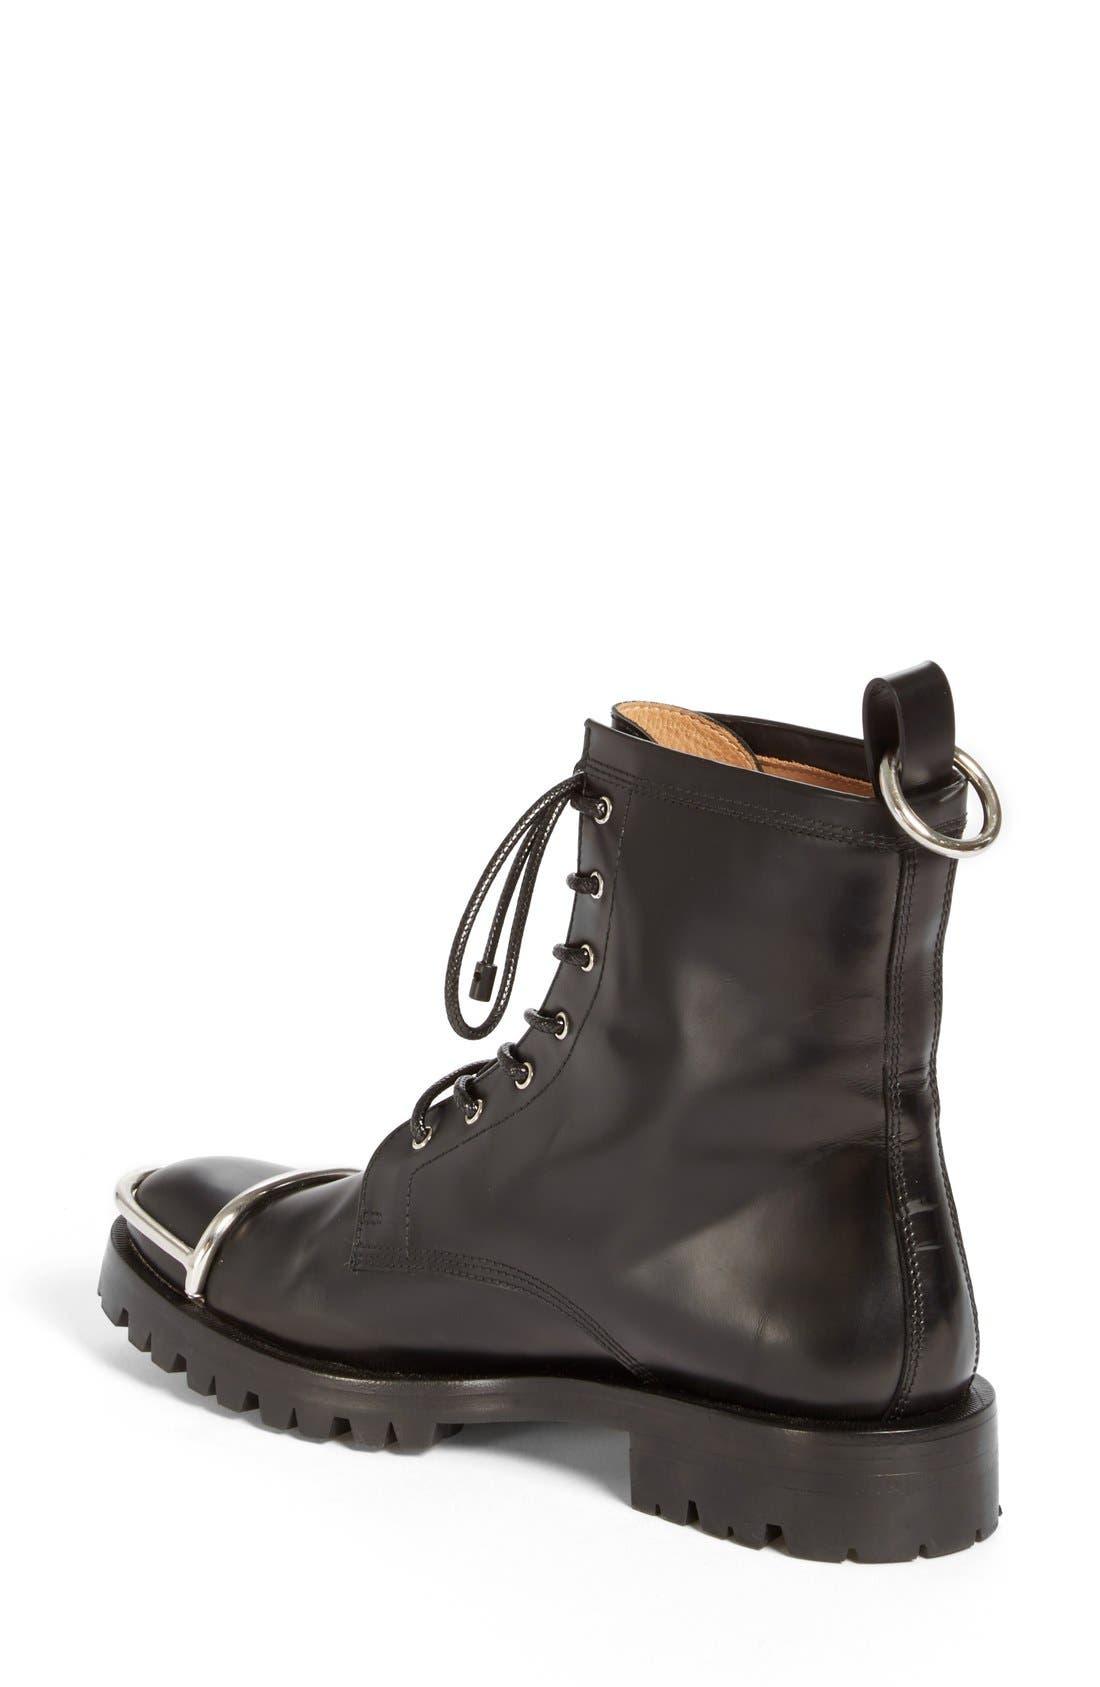 Alternate Image 2  - Alexander Wang 'Lyndon' Military Boot (Women)